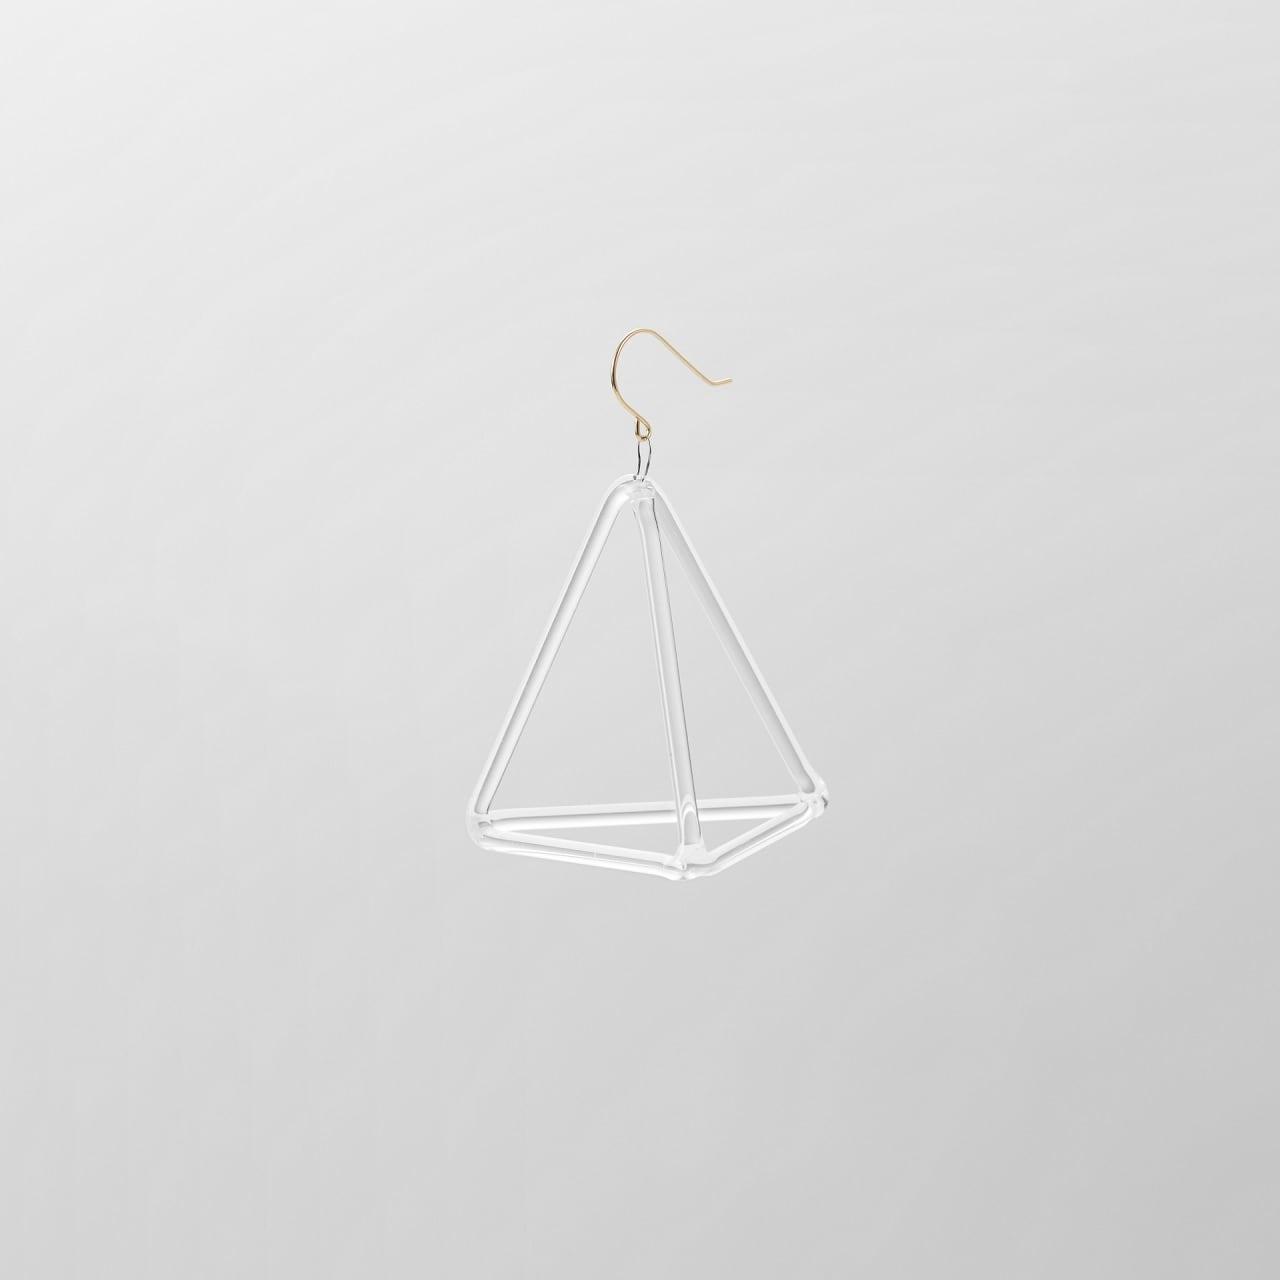 _cthruit シースルーイット triangle pyramid earring ピアス 【Clear】